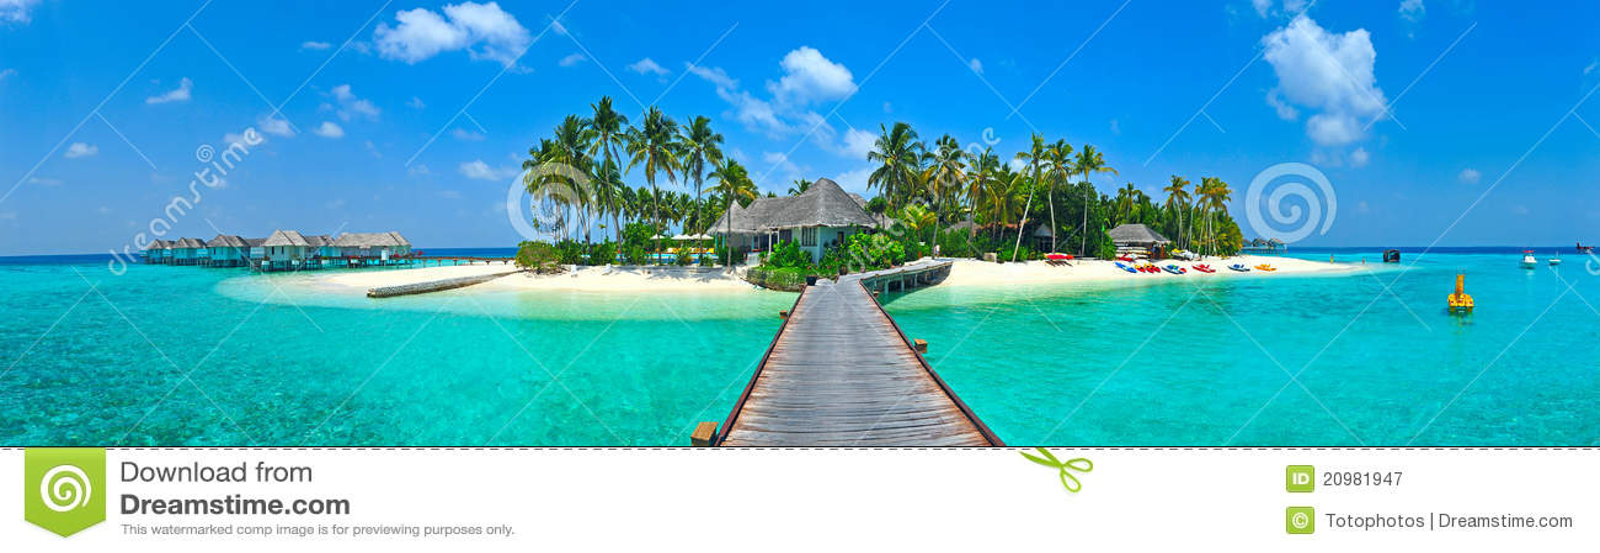 Panorama do console de Maldives